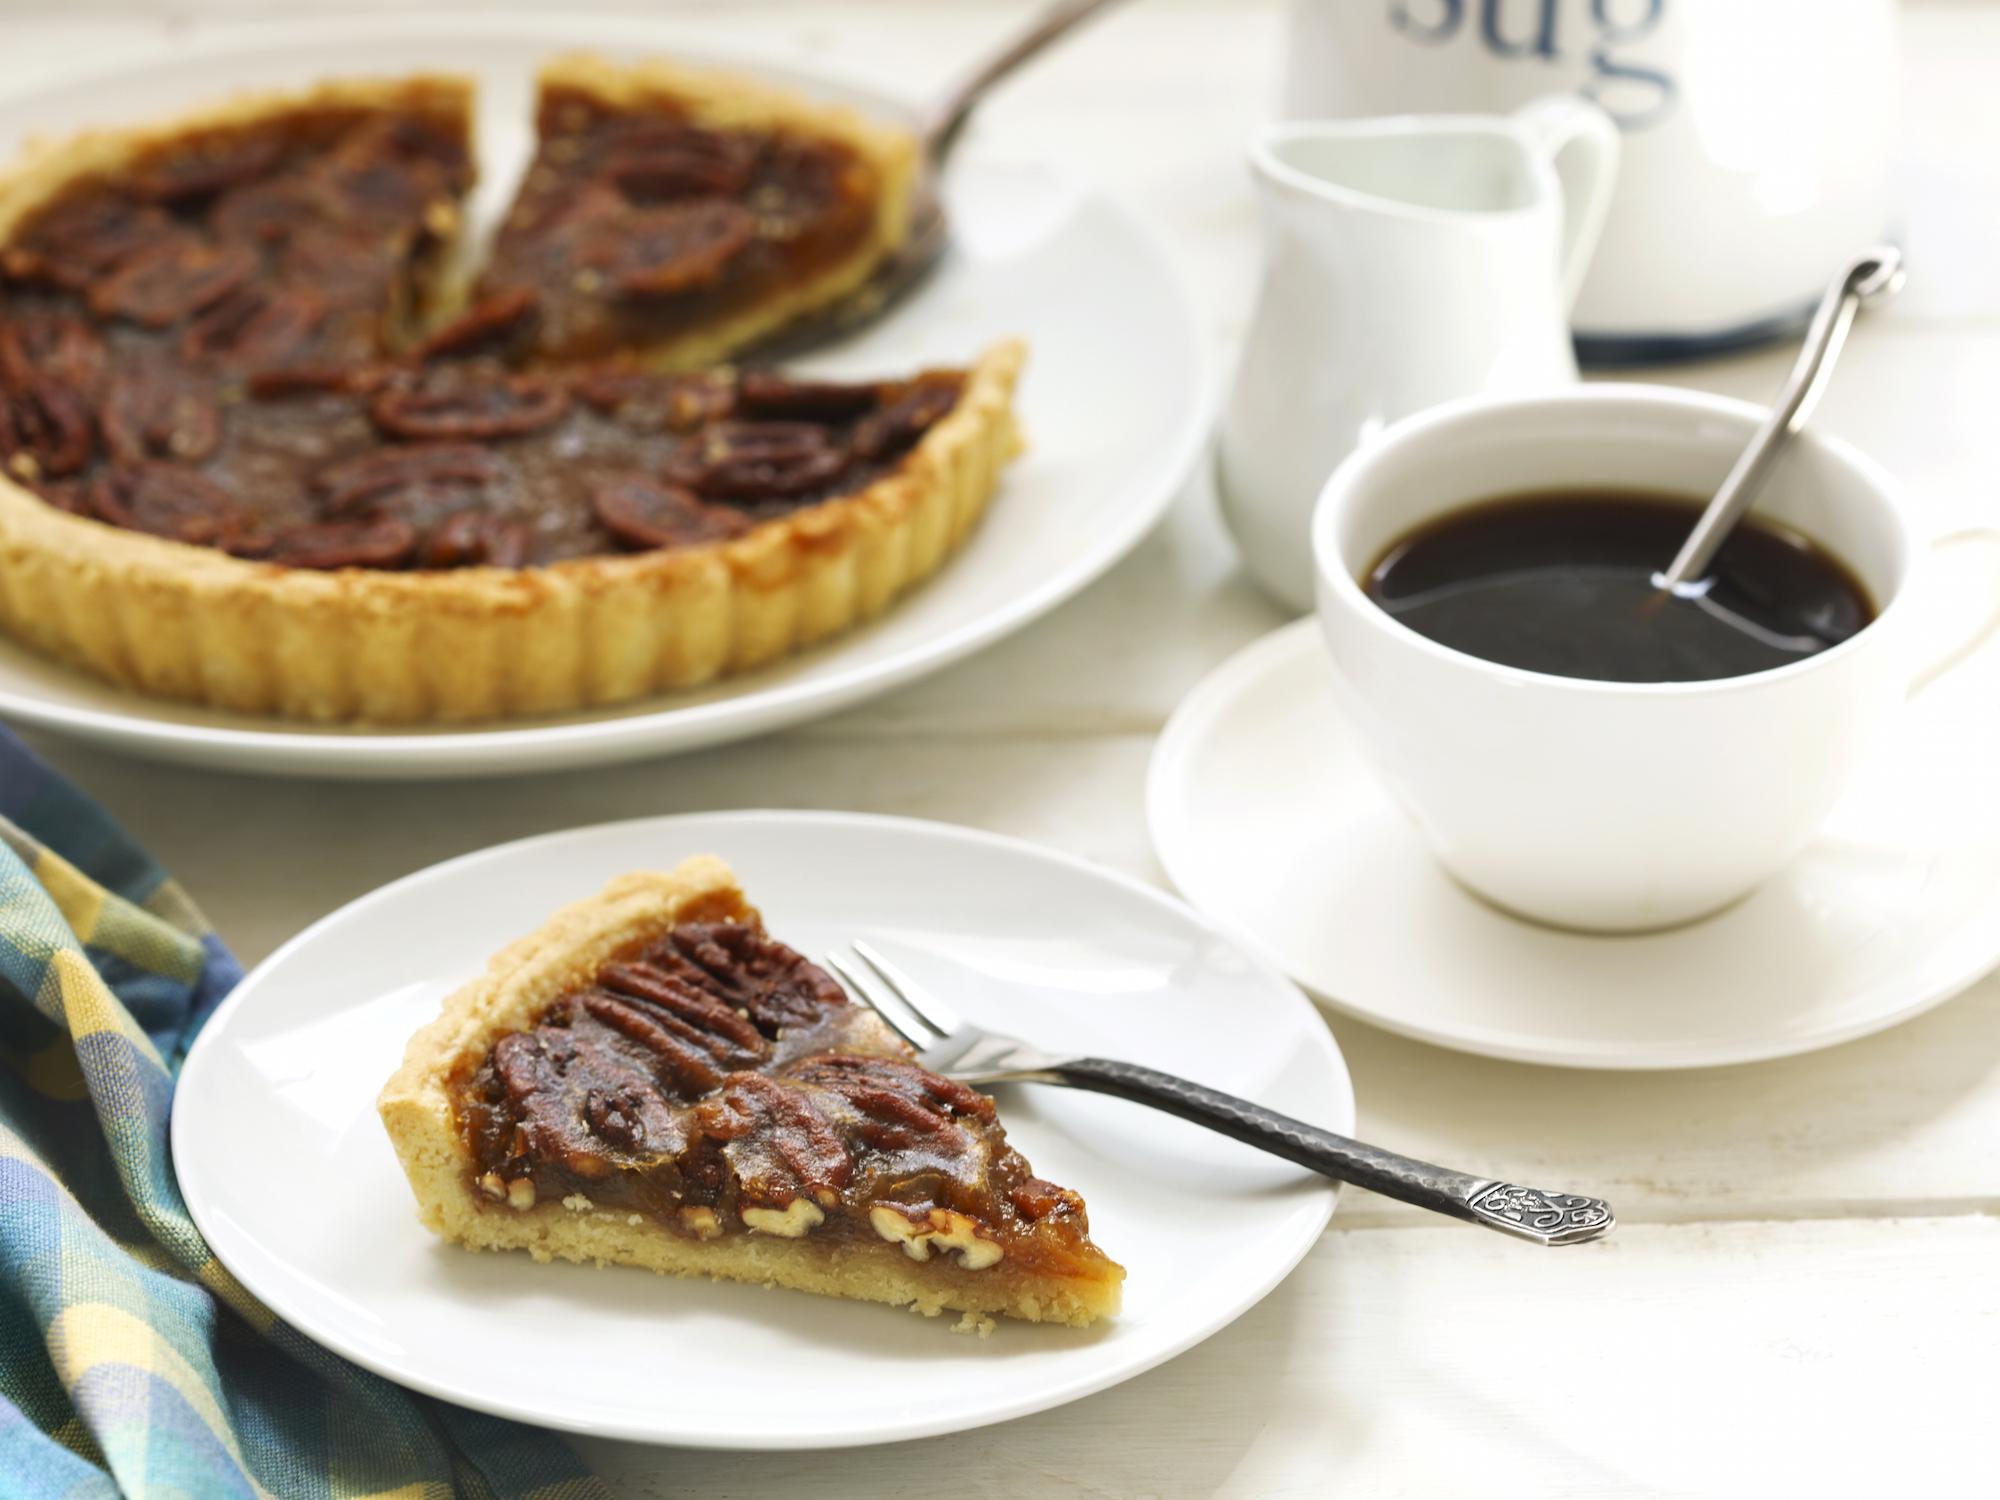 pie-for-breakfast-pi-day.jpg